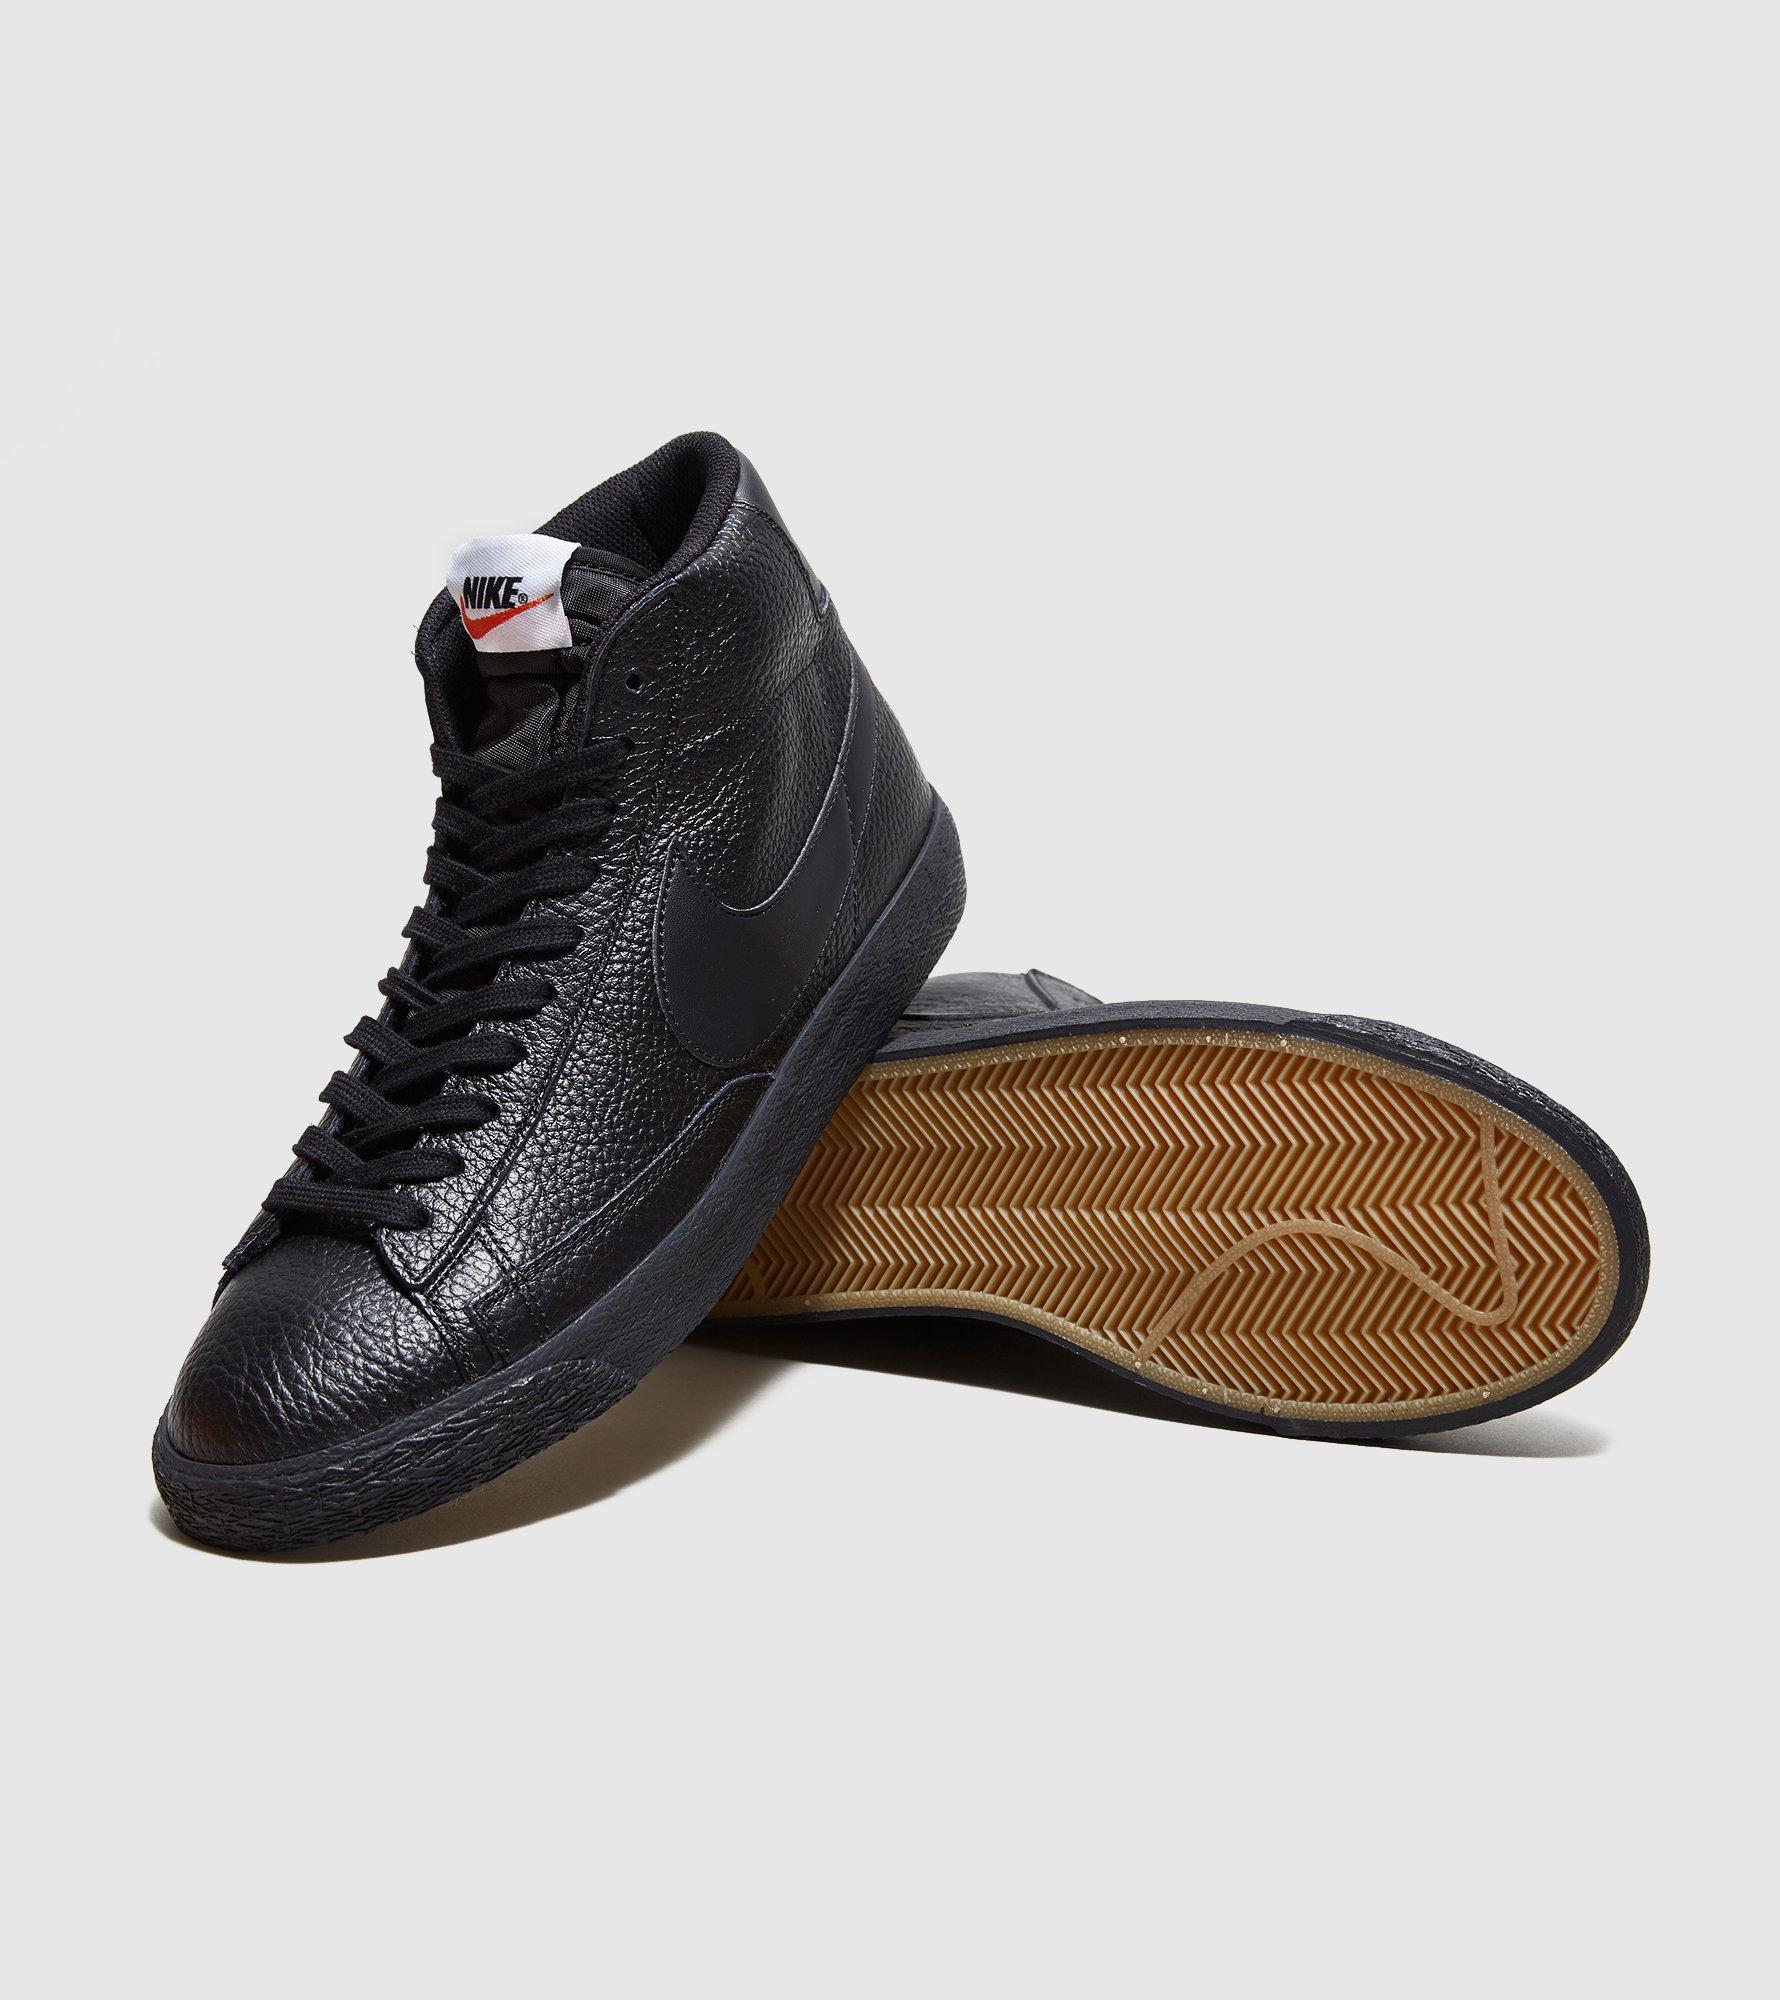 Nike Blazer En Cuir Cru Salut